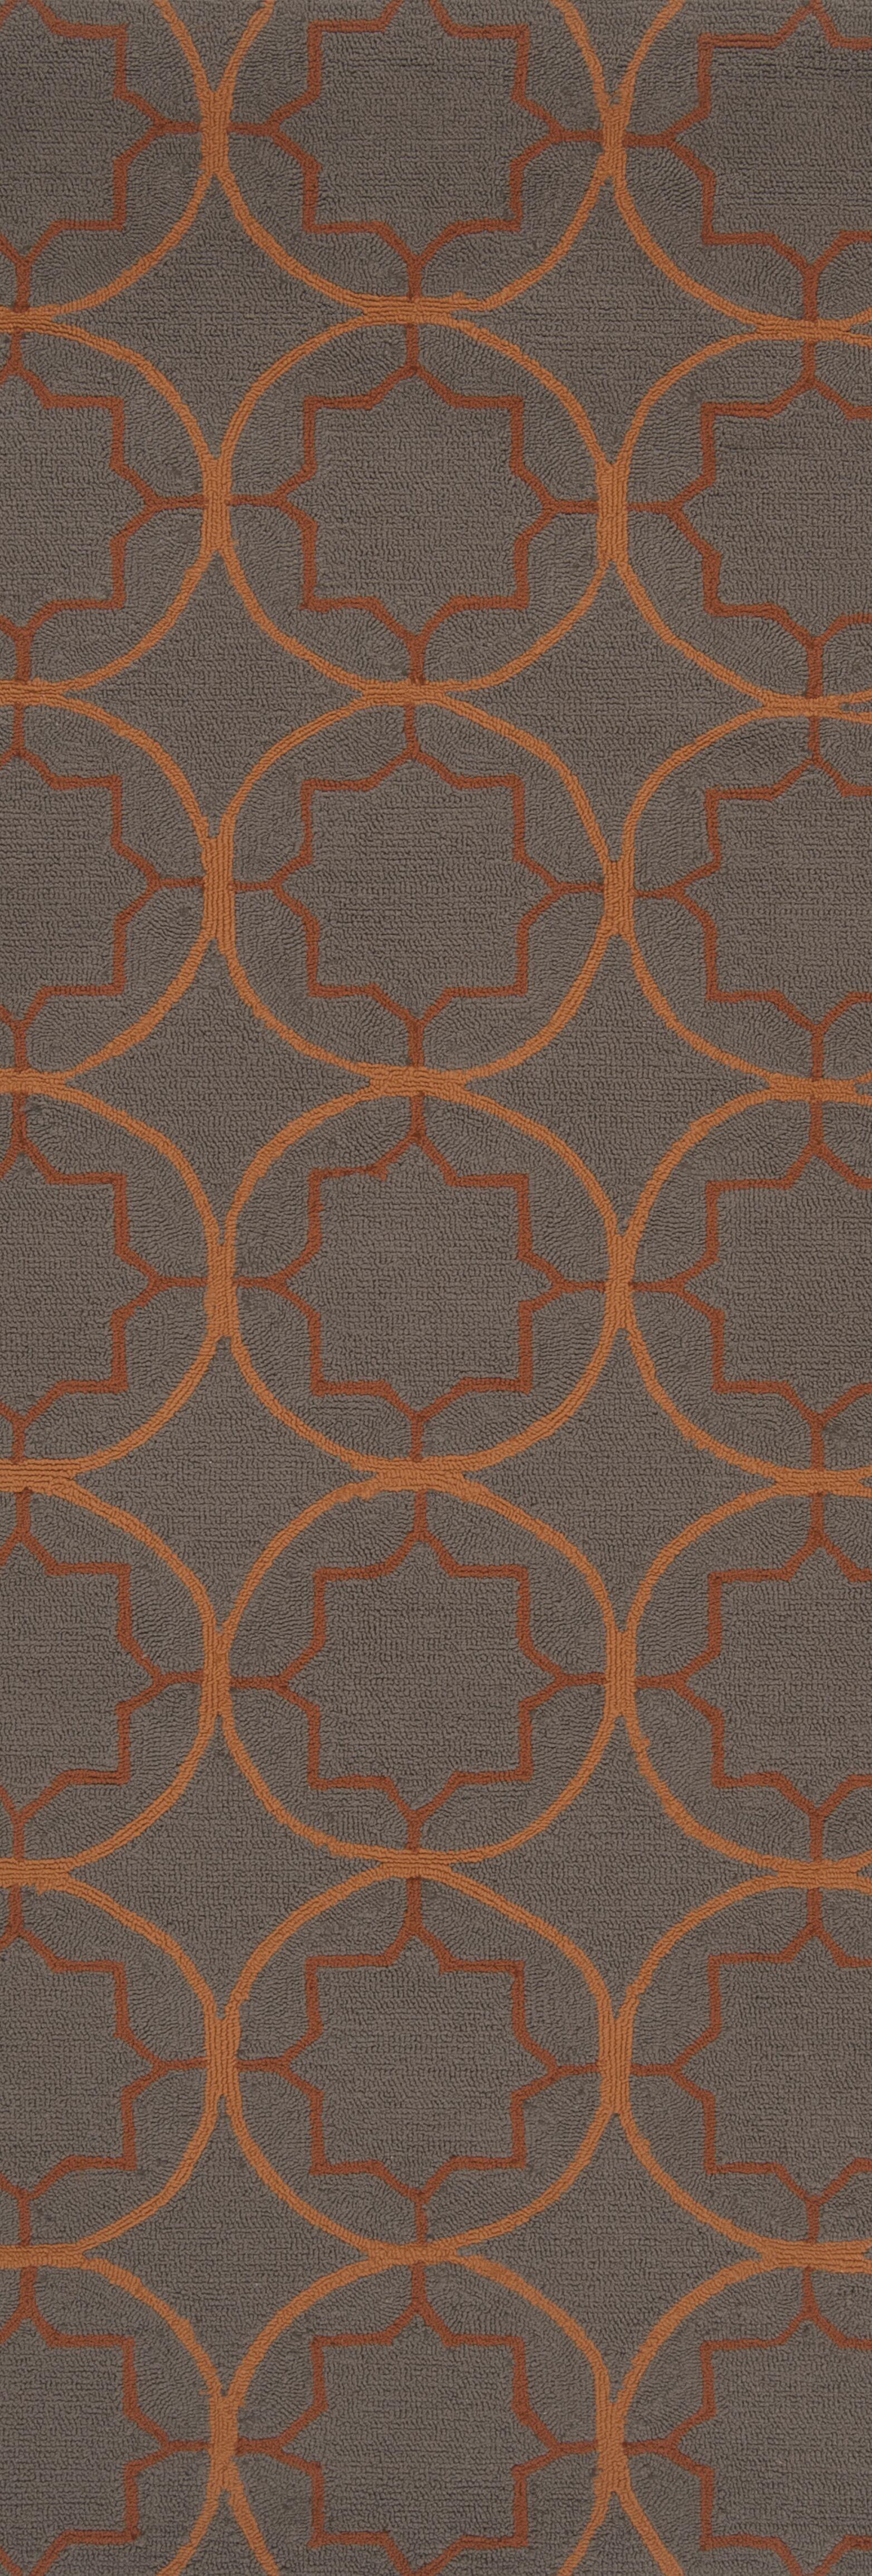 Becker Circle Indoor/Outdoor Rug Rug Size: Rectangle 3' x 5'